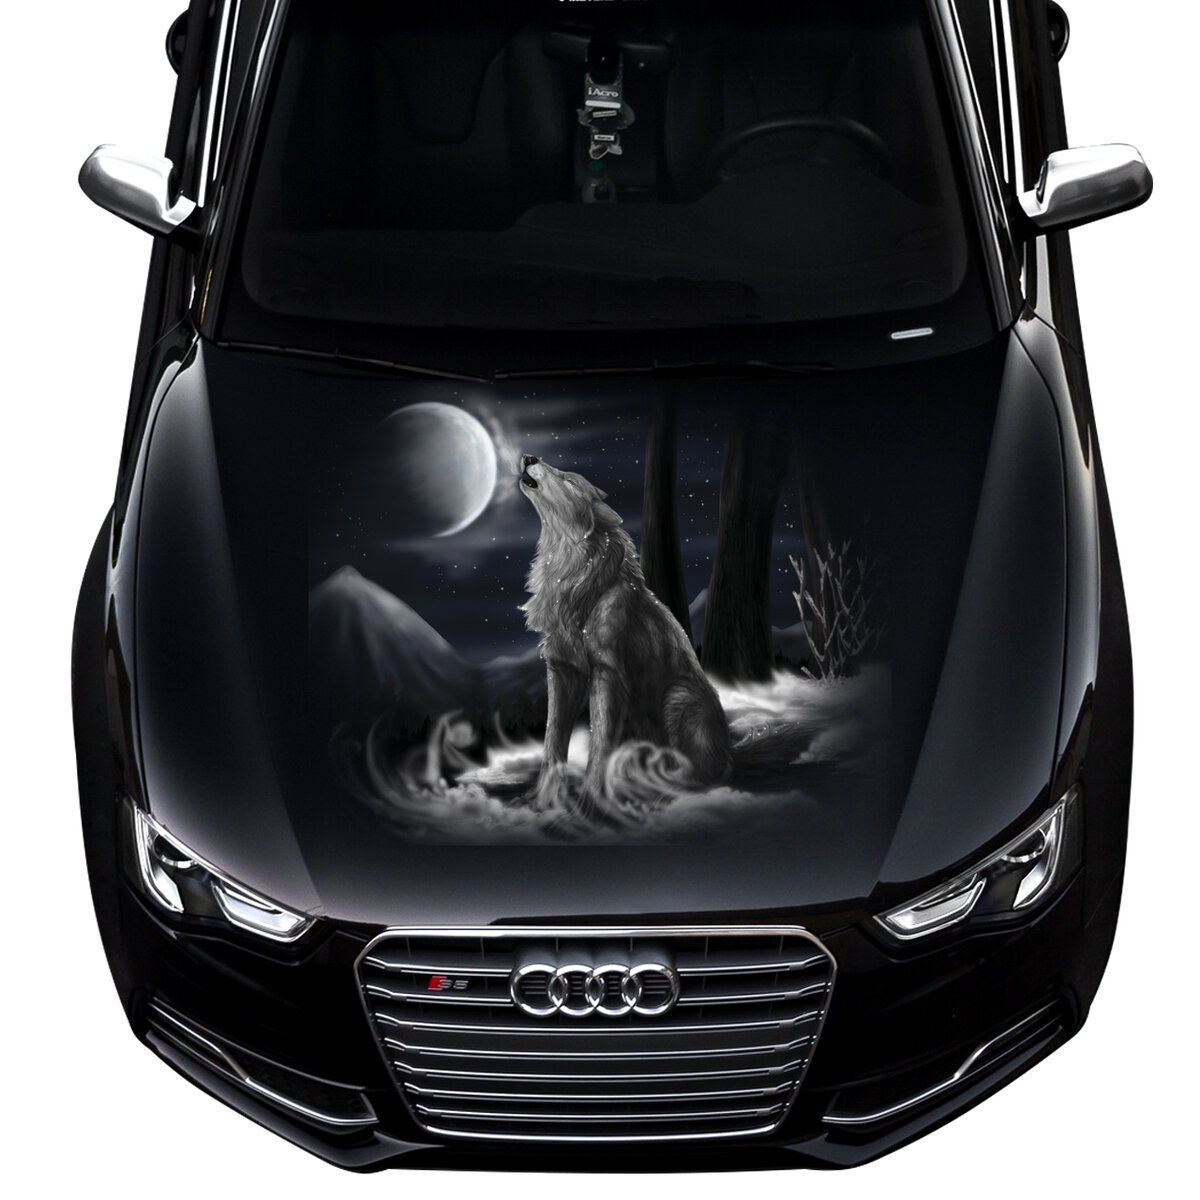 Картинка на капоте машины